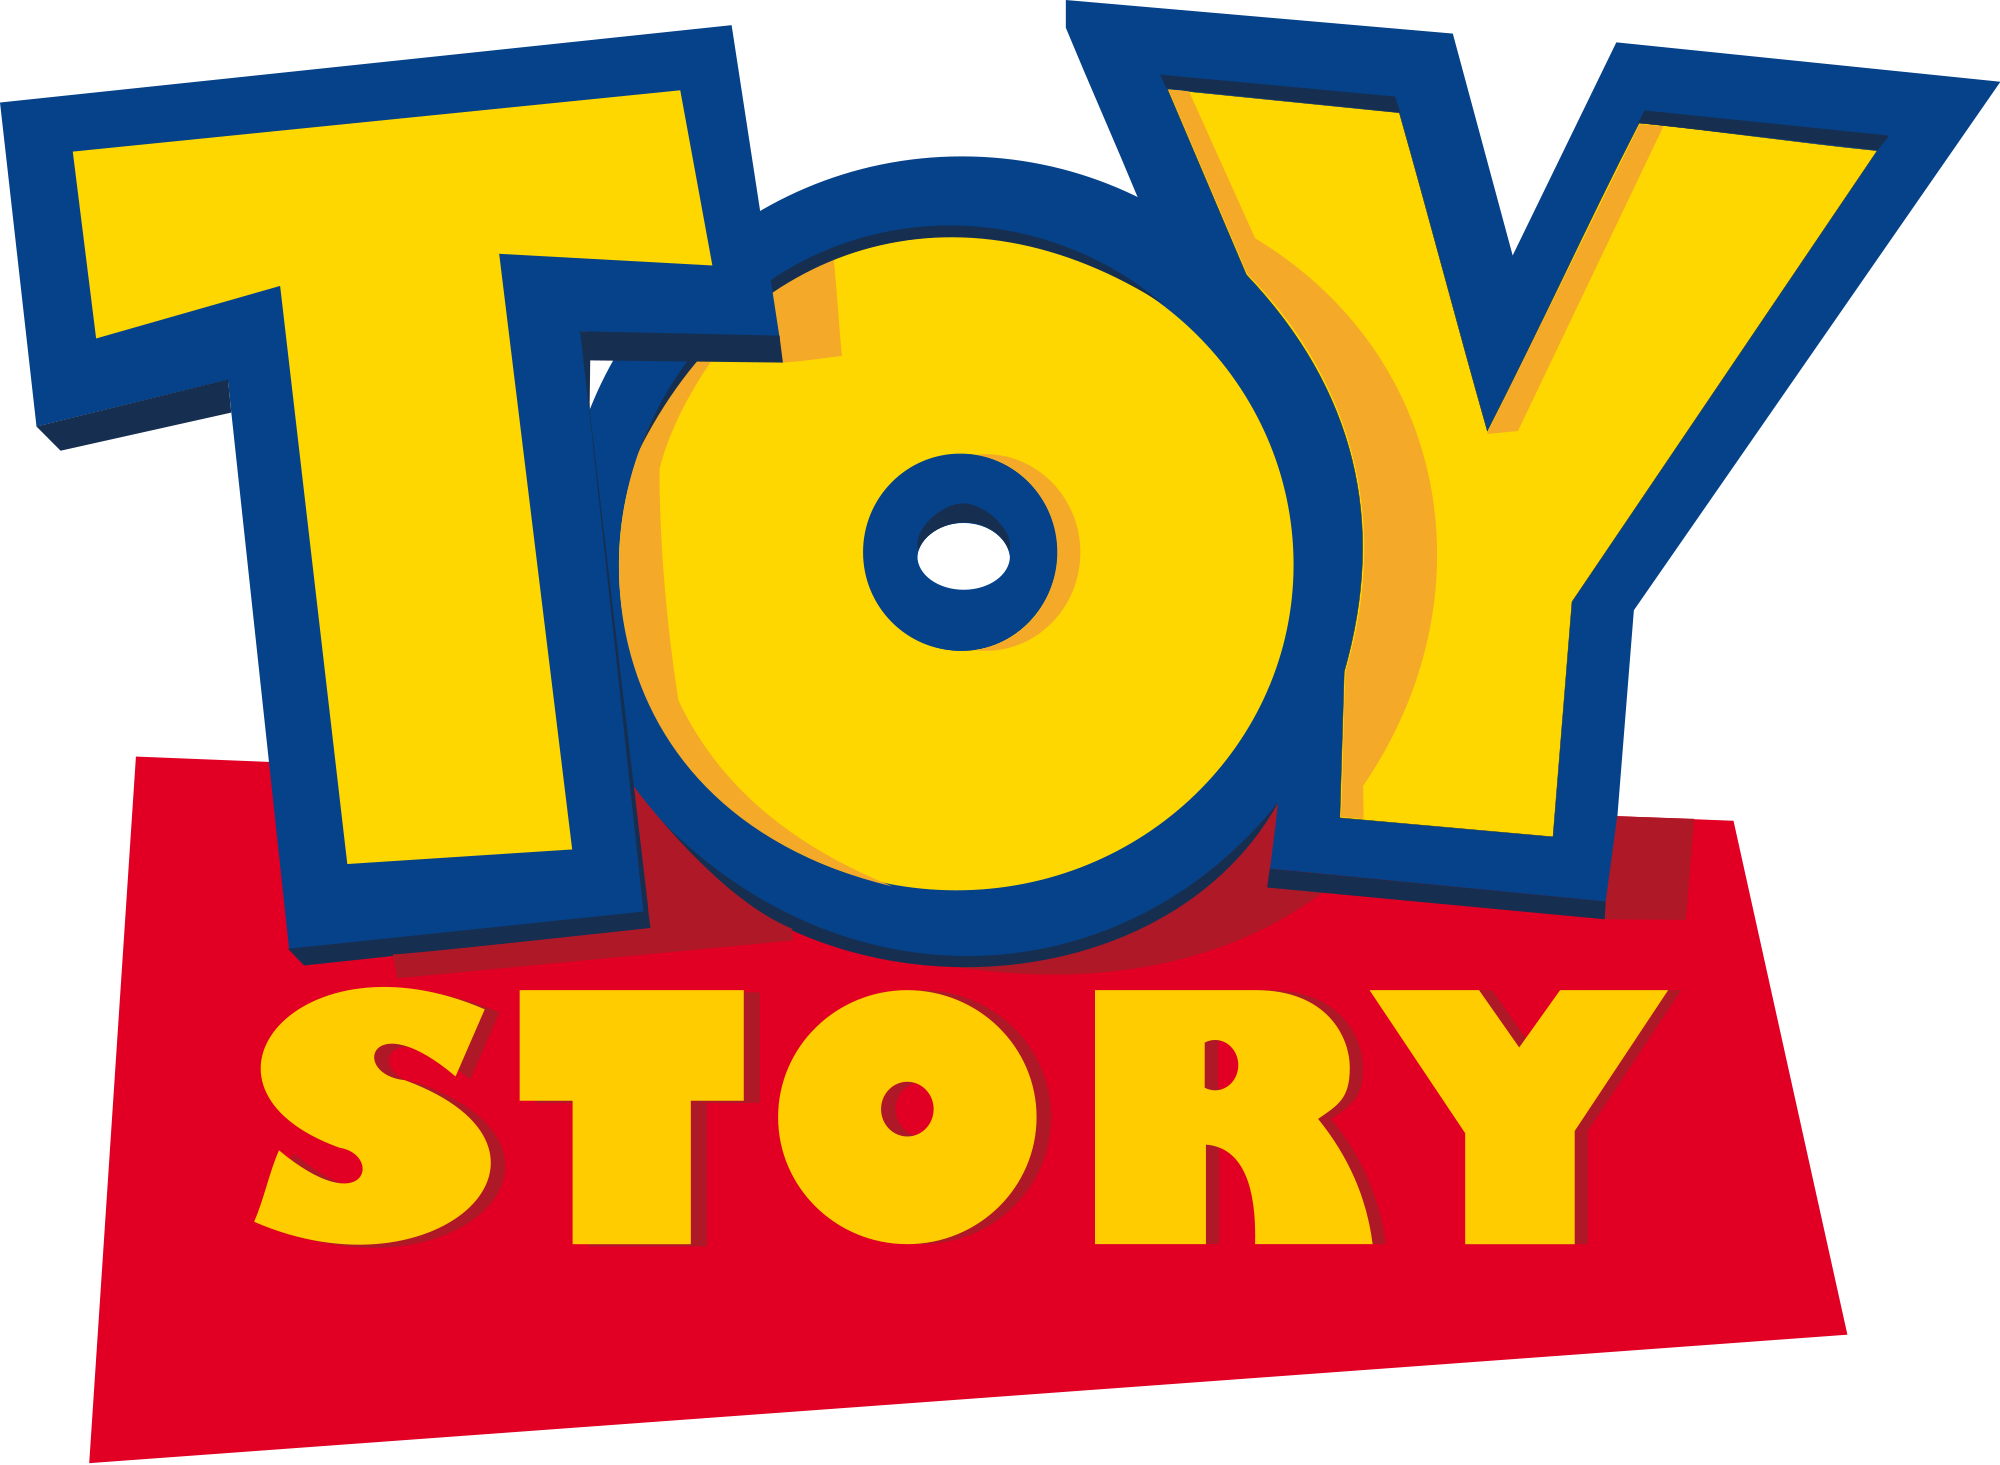 image toy story logo png pixar wiki fandom powered by wikia rh pixar wikia com toy story logo font download toy story logo font generator